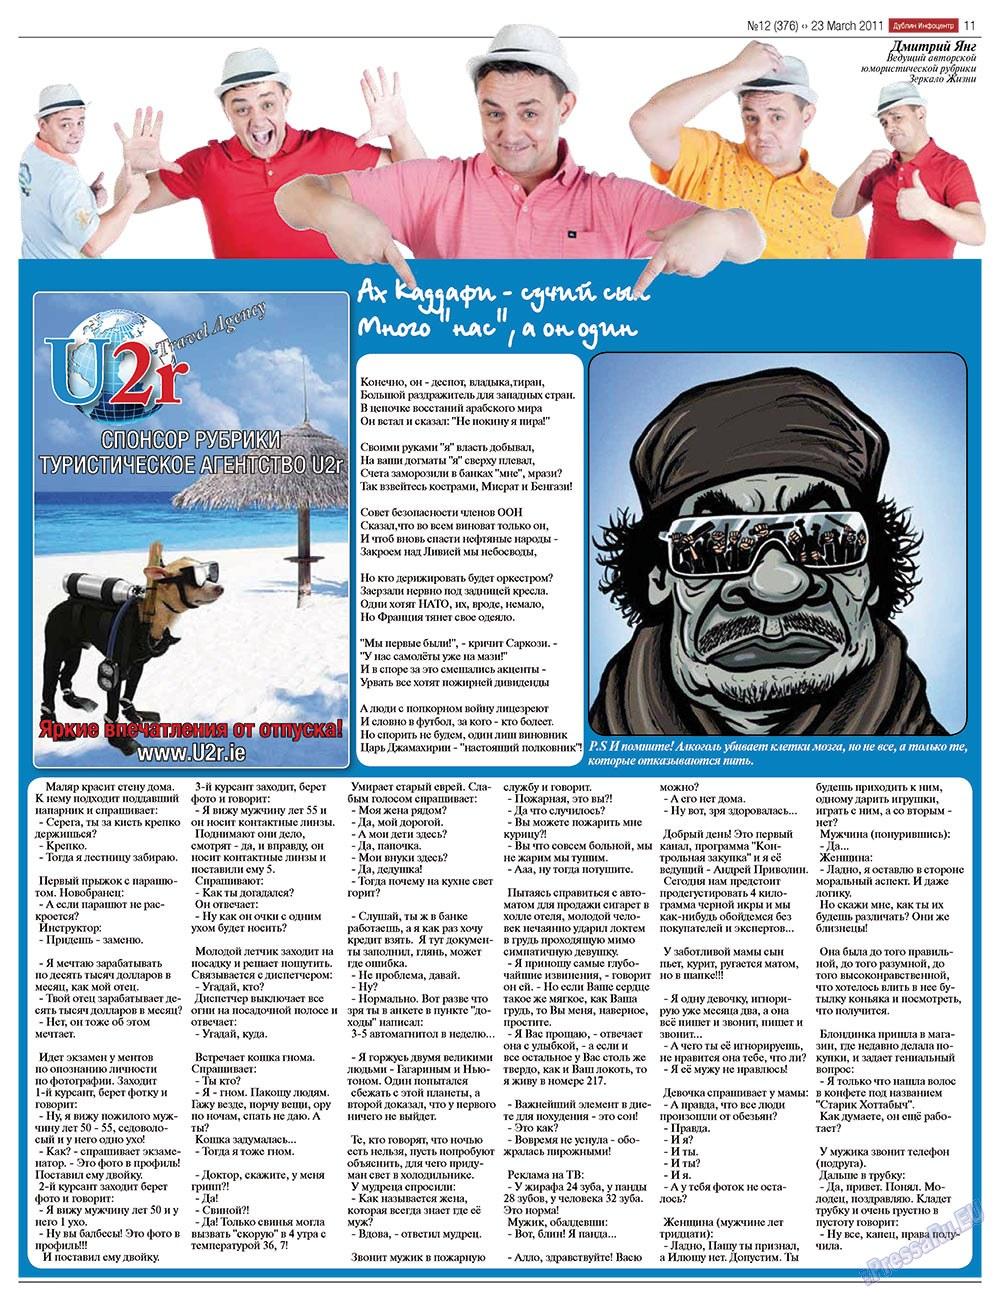 Дублин инфоцентр (газета). 2011 год, номер 12, стр. 11